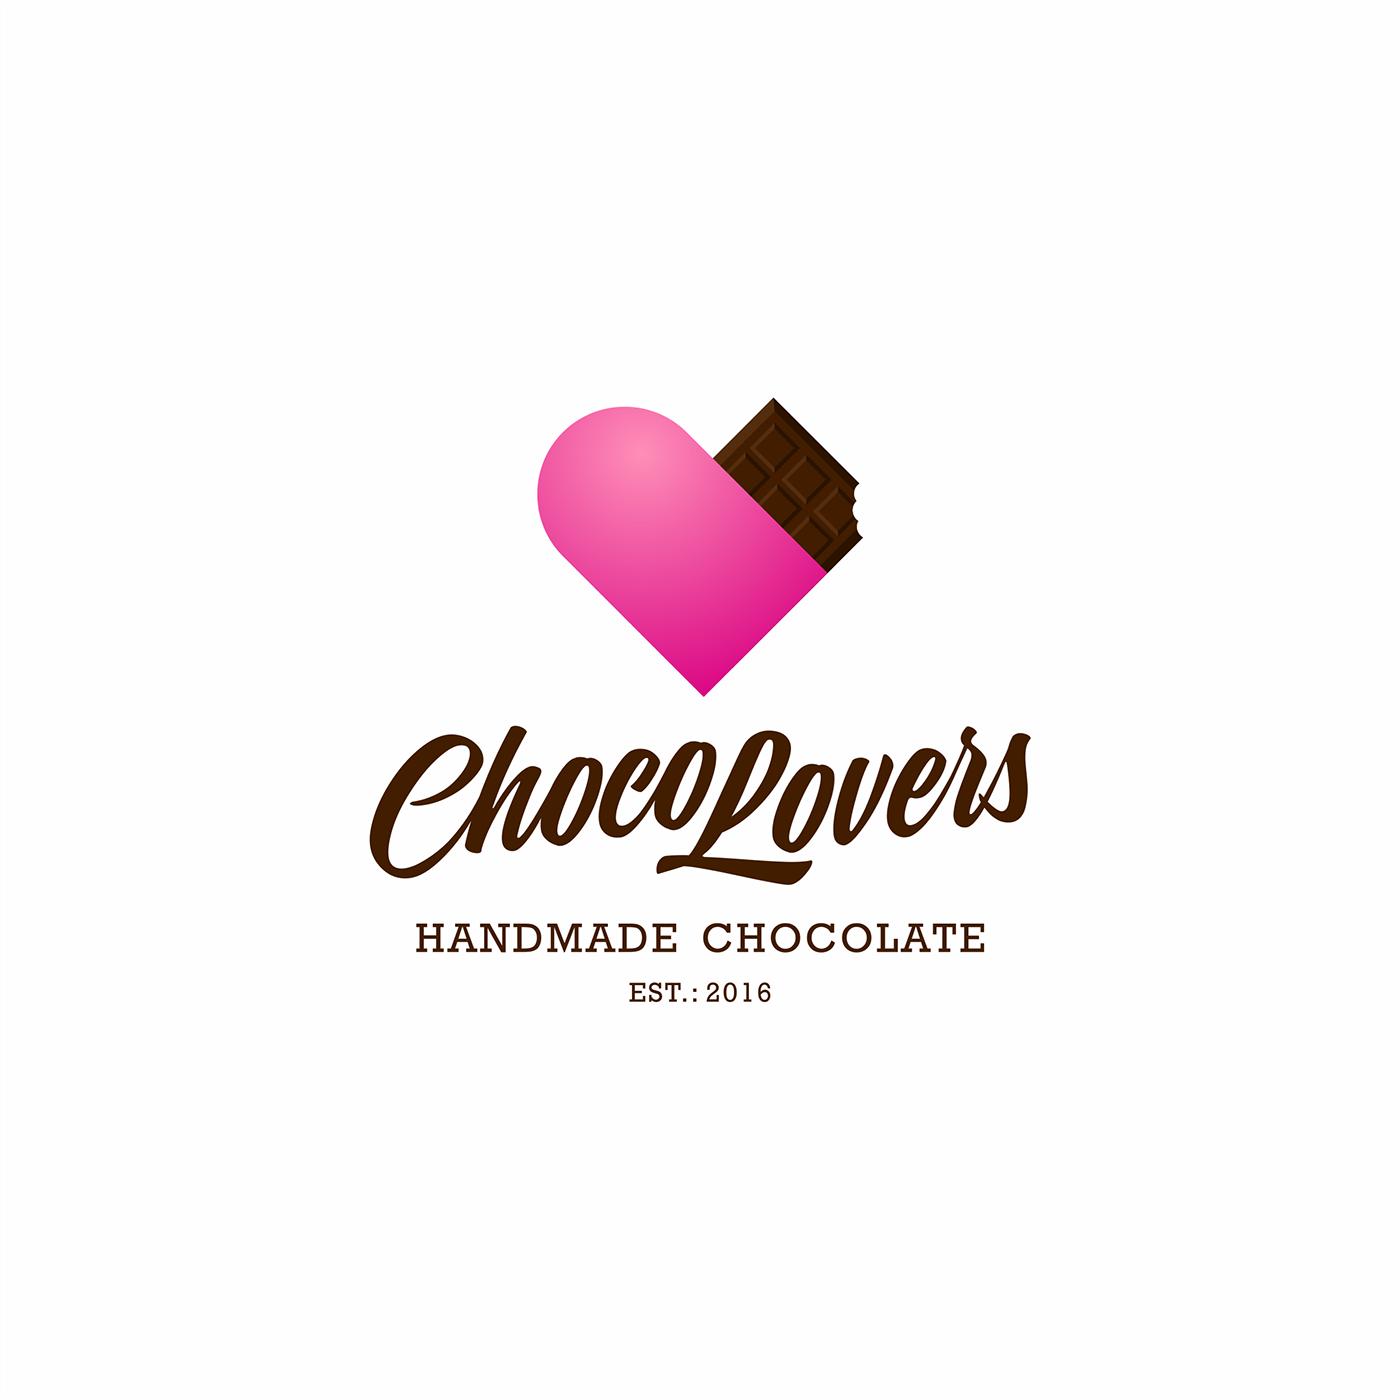 choco Lovers pink chocolate logo branding  identity Packaging